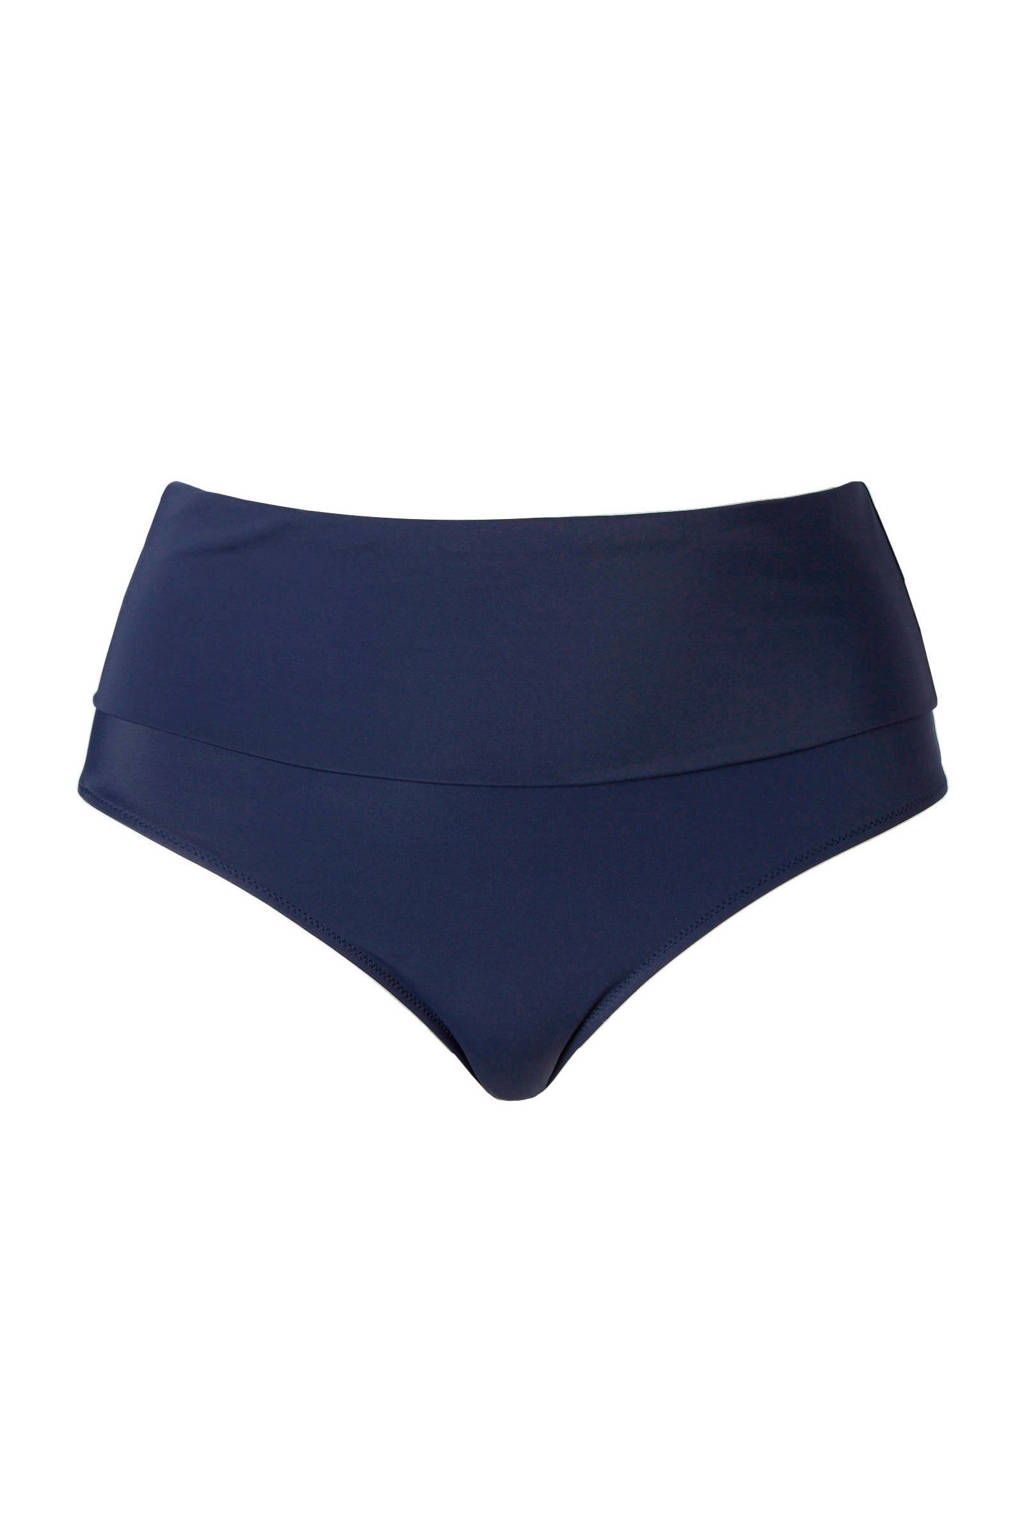 Zizzi Mix & Match corrigerende omslag bikinibroekje +size donkerblauw, Donkerblauw